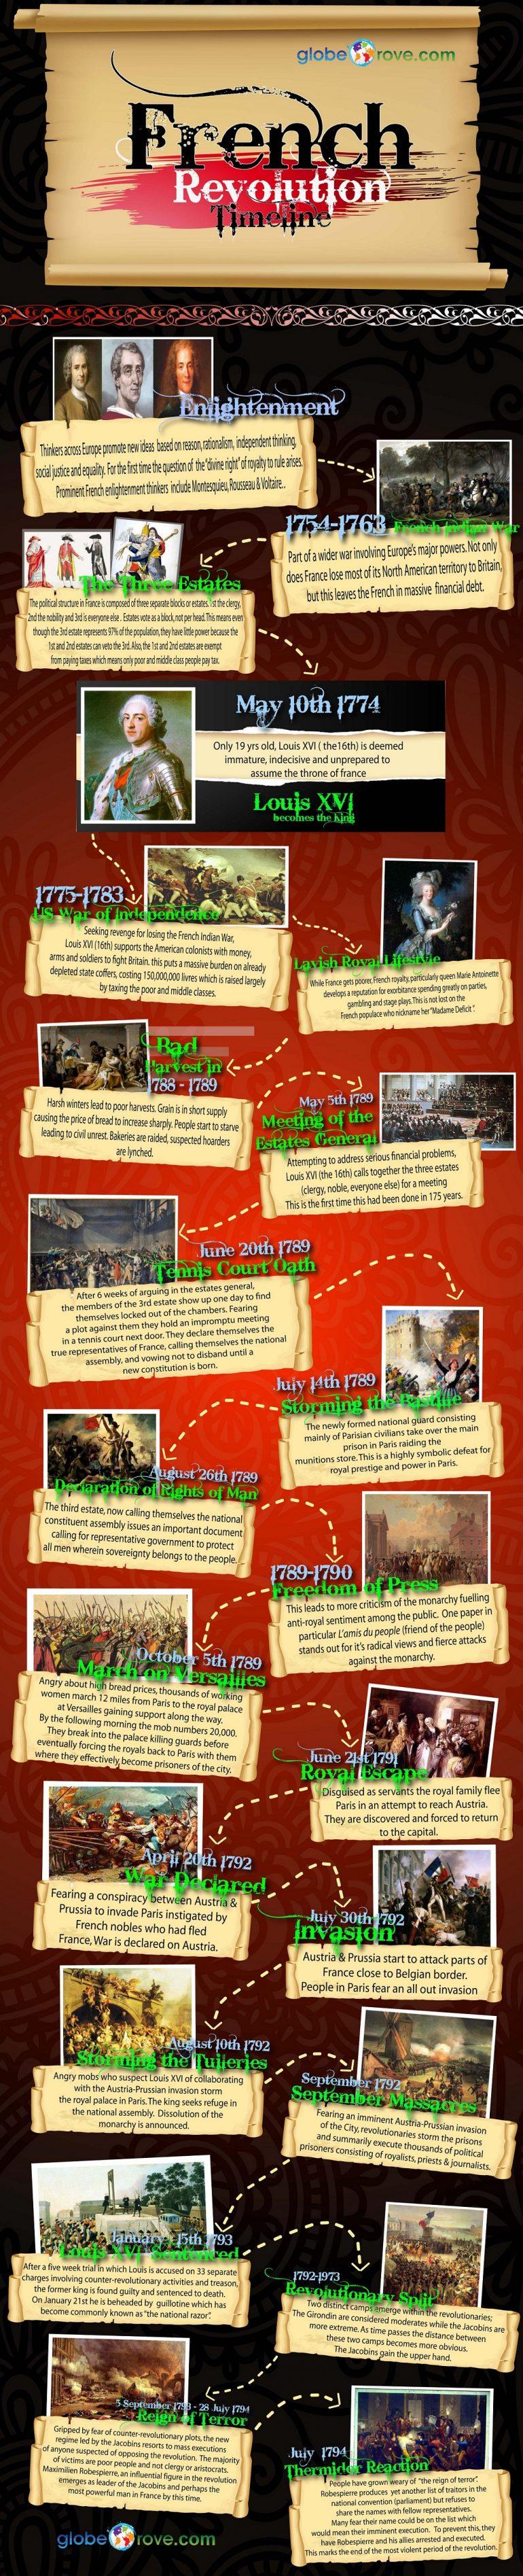 French Revolution Timeline Infographic